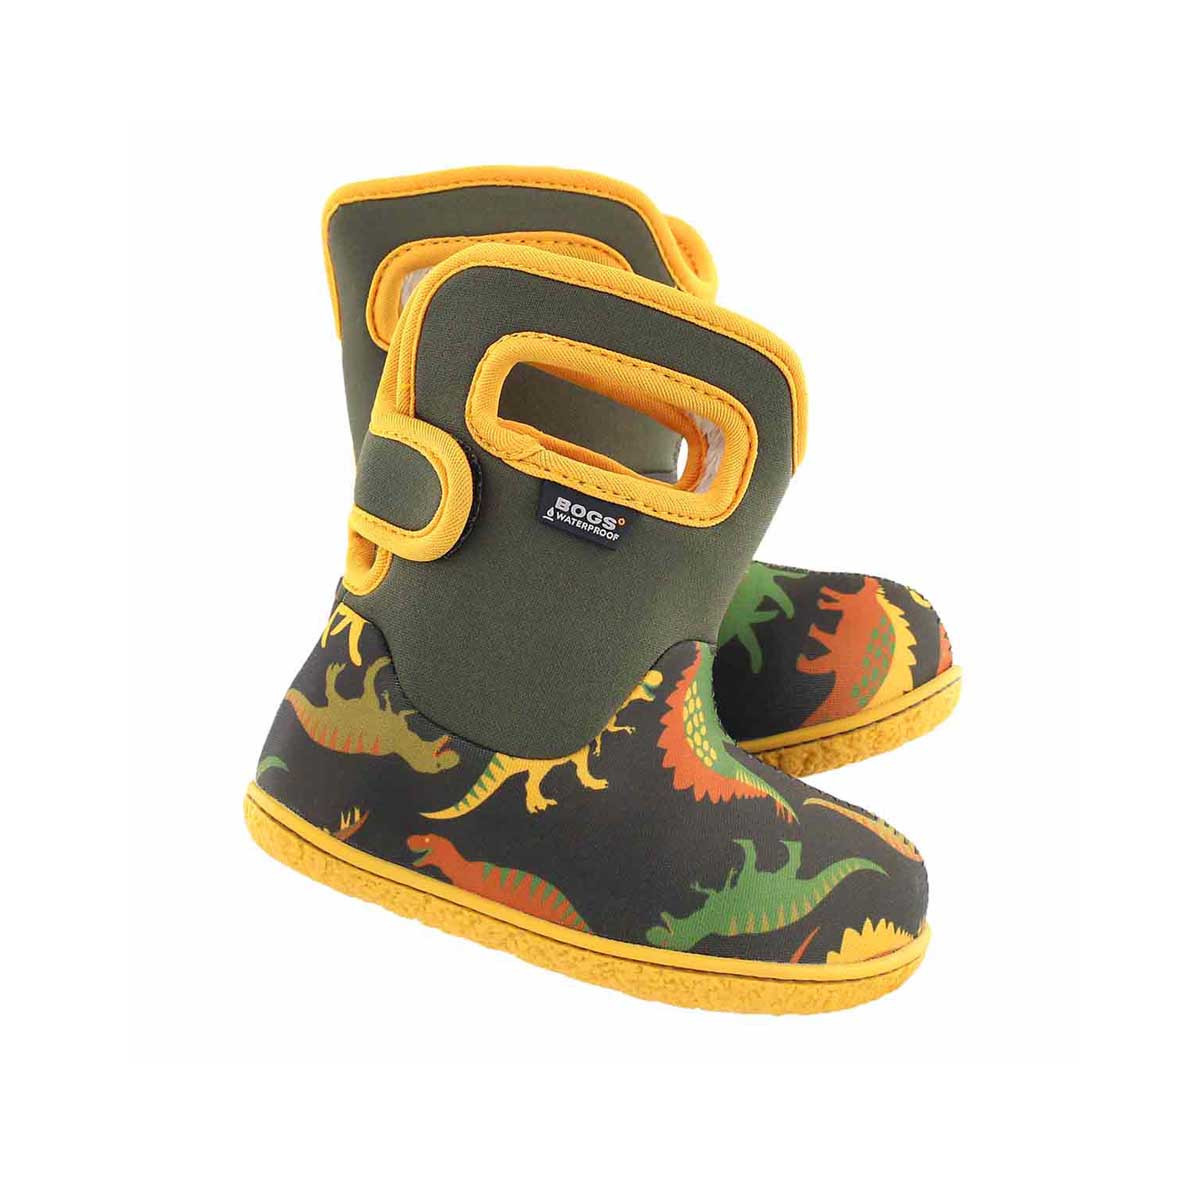 Inf-b Dino moss multi wtpf boot